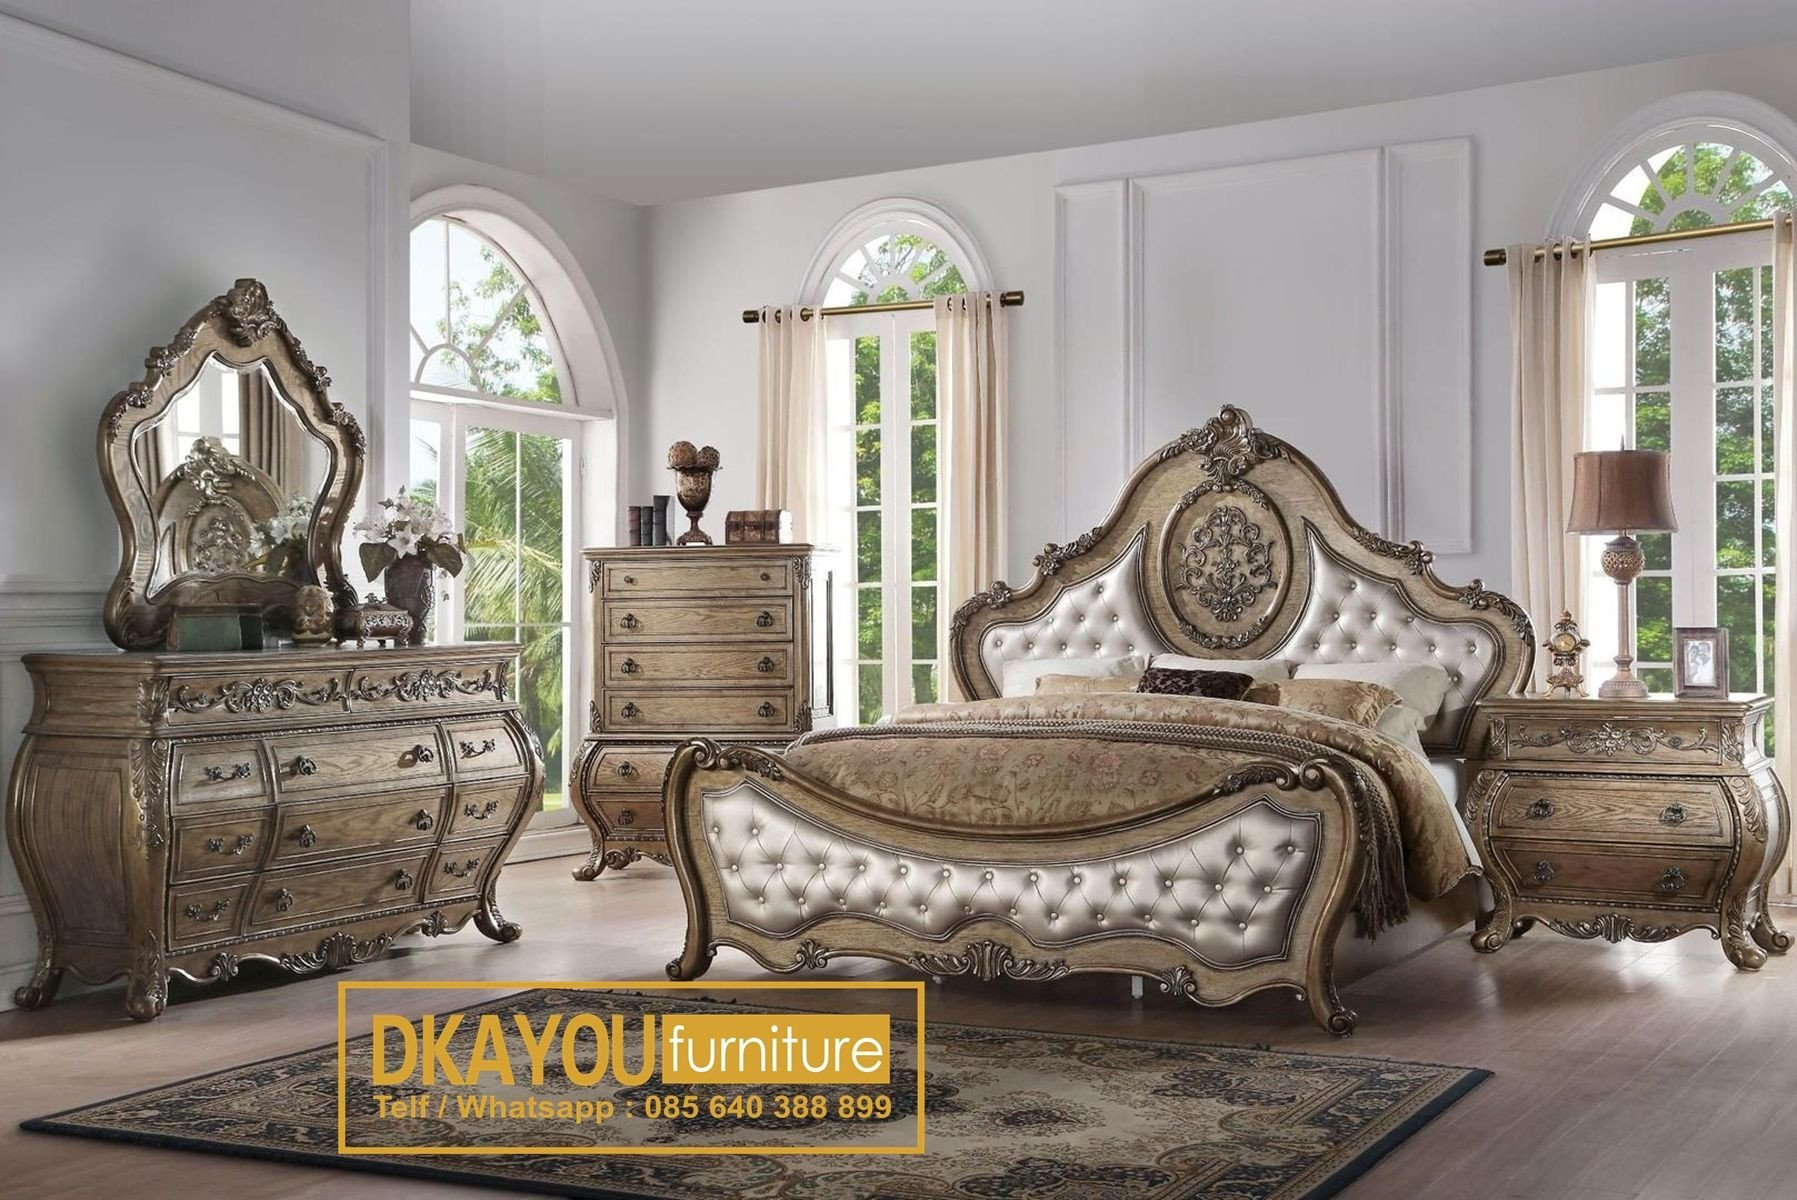 Monte Carlo Bedroom Set New Set Kamar Tidur Mewah Klasik Eropa Terbaru Royal Wedding Bed